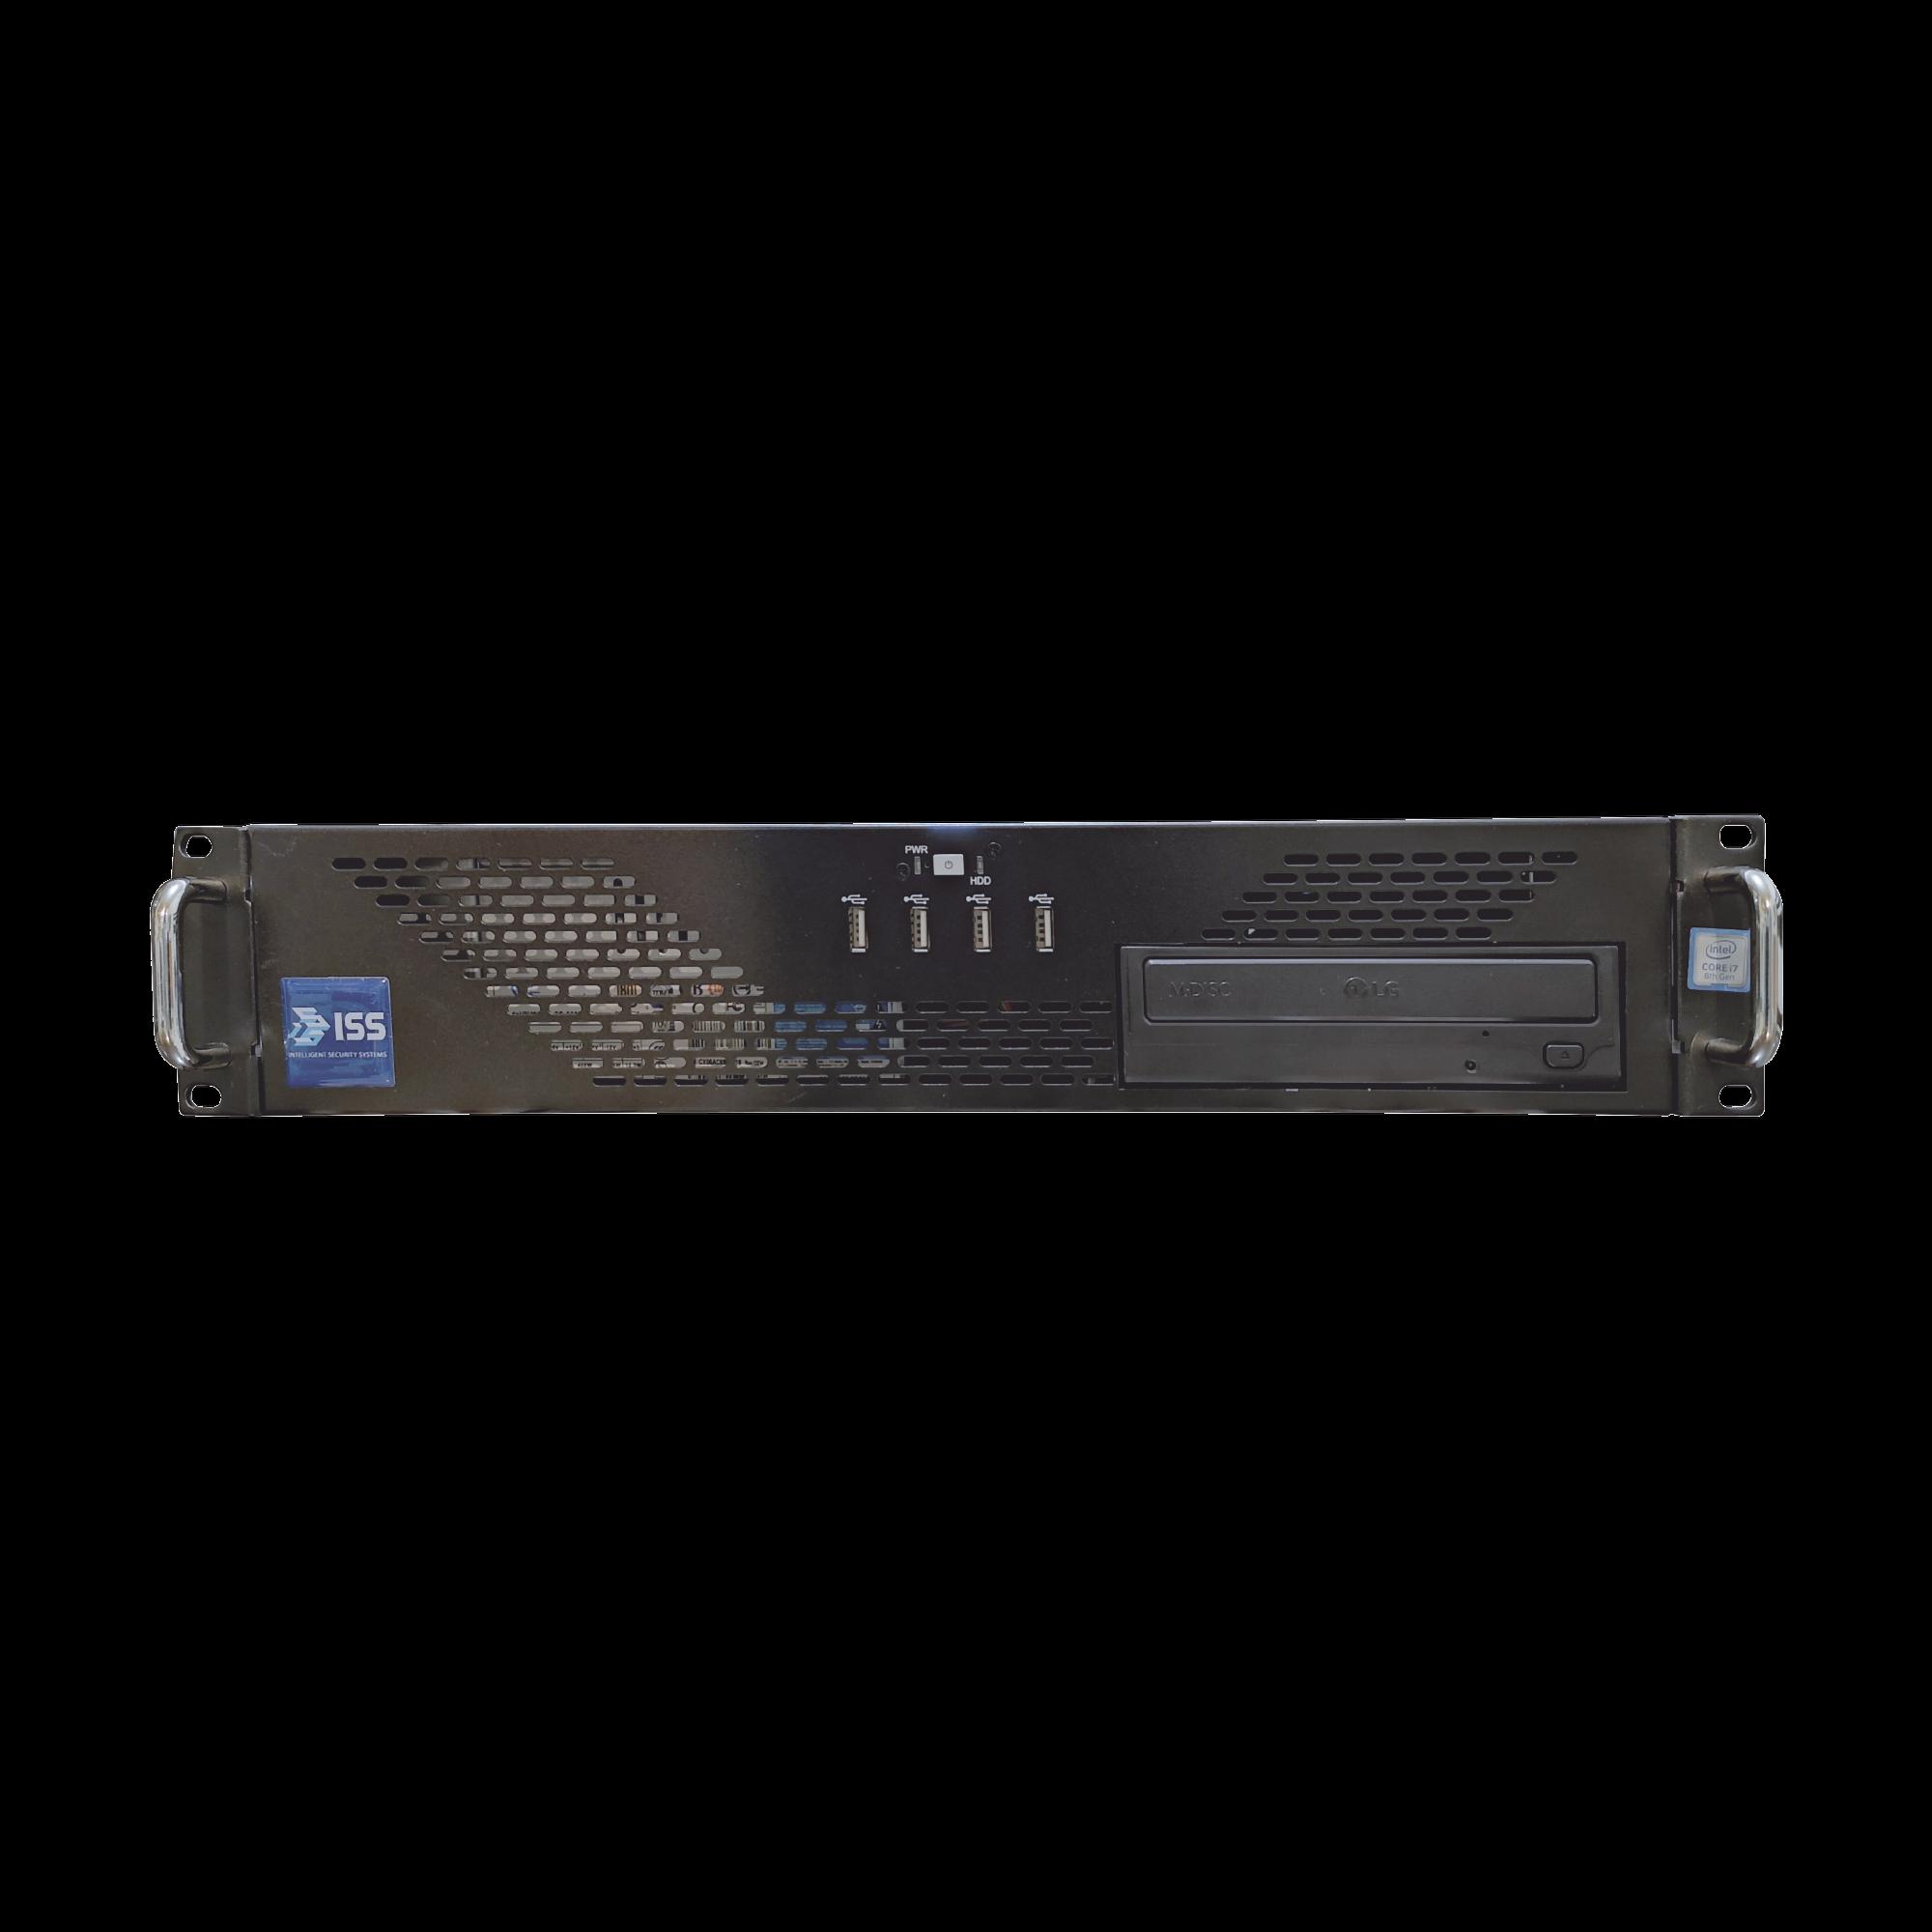 Video Wall Inteligente ISS (Software + Controlador) - Hasta 16 salidas Full HD